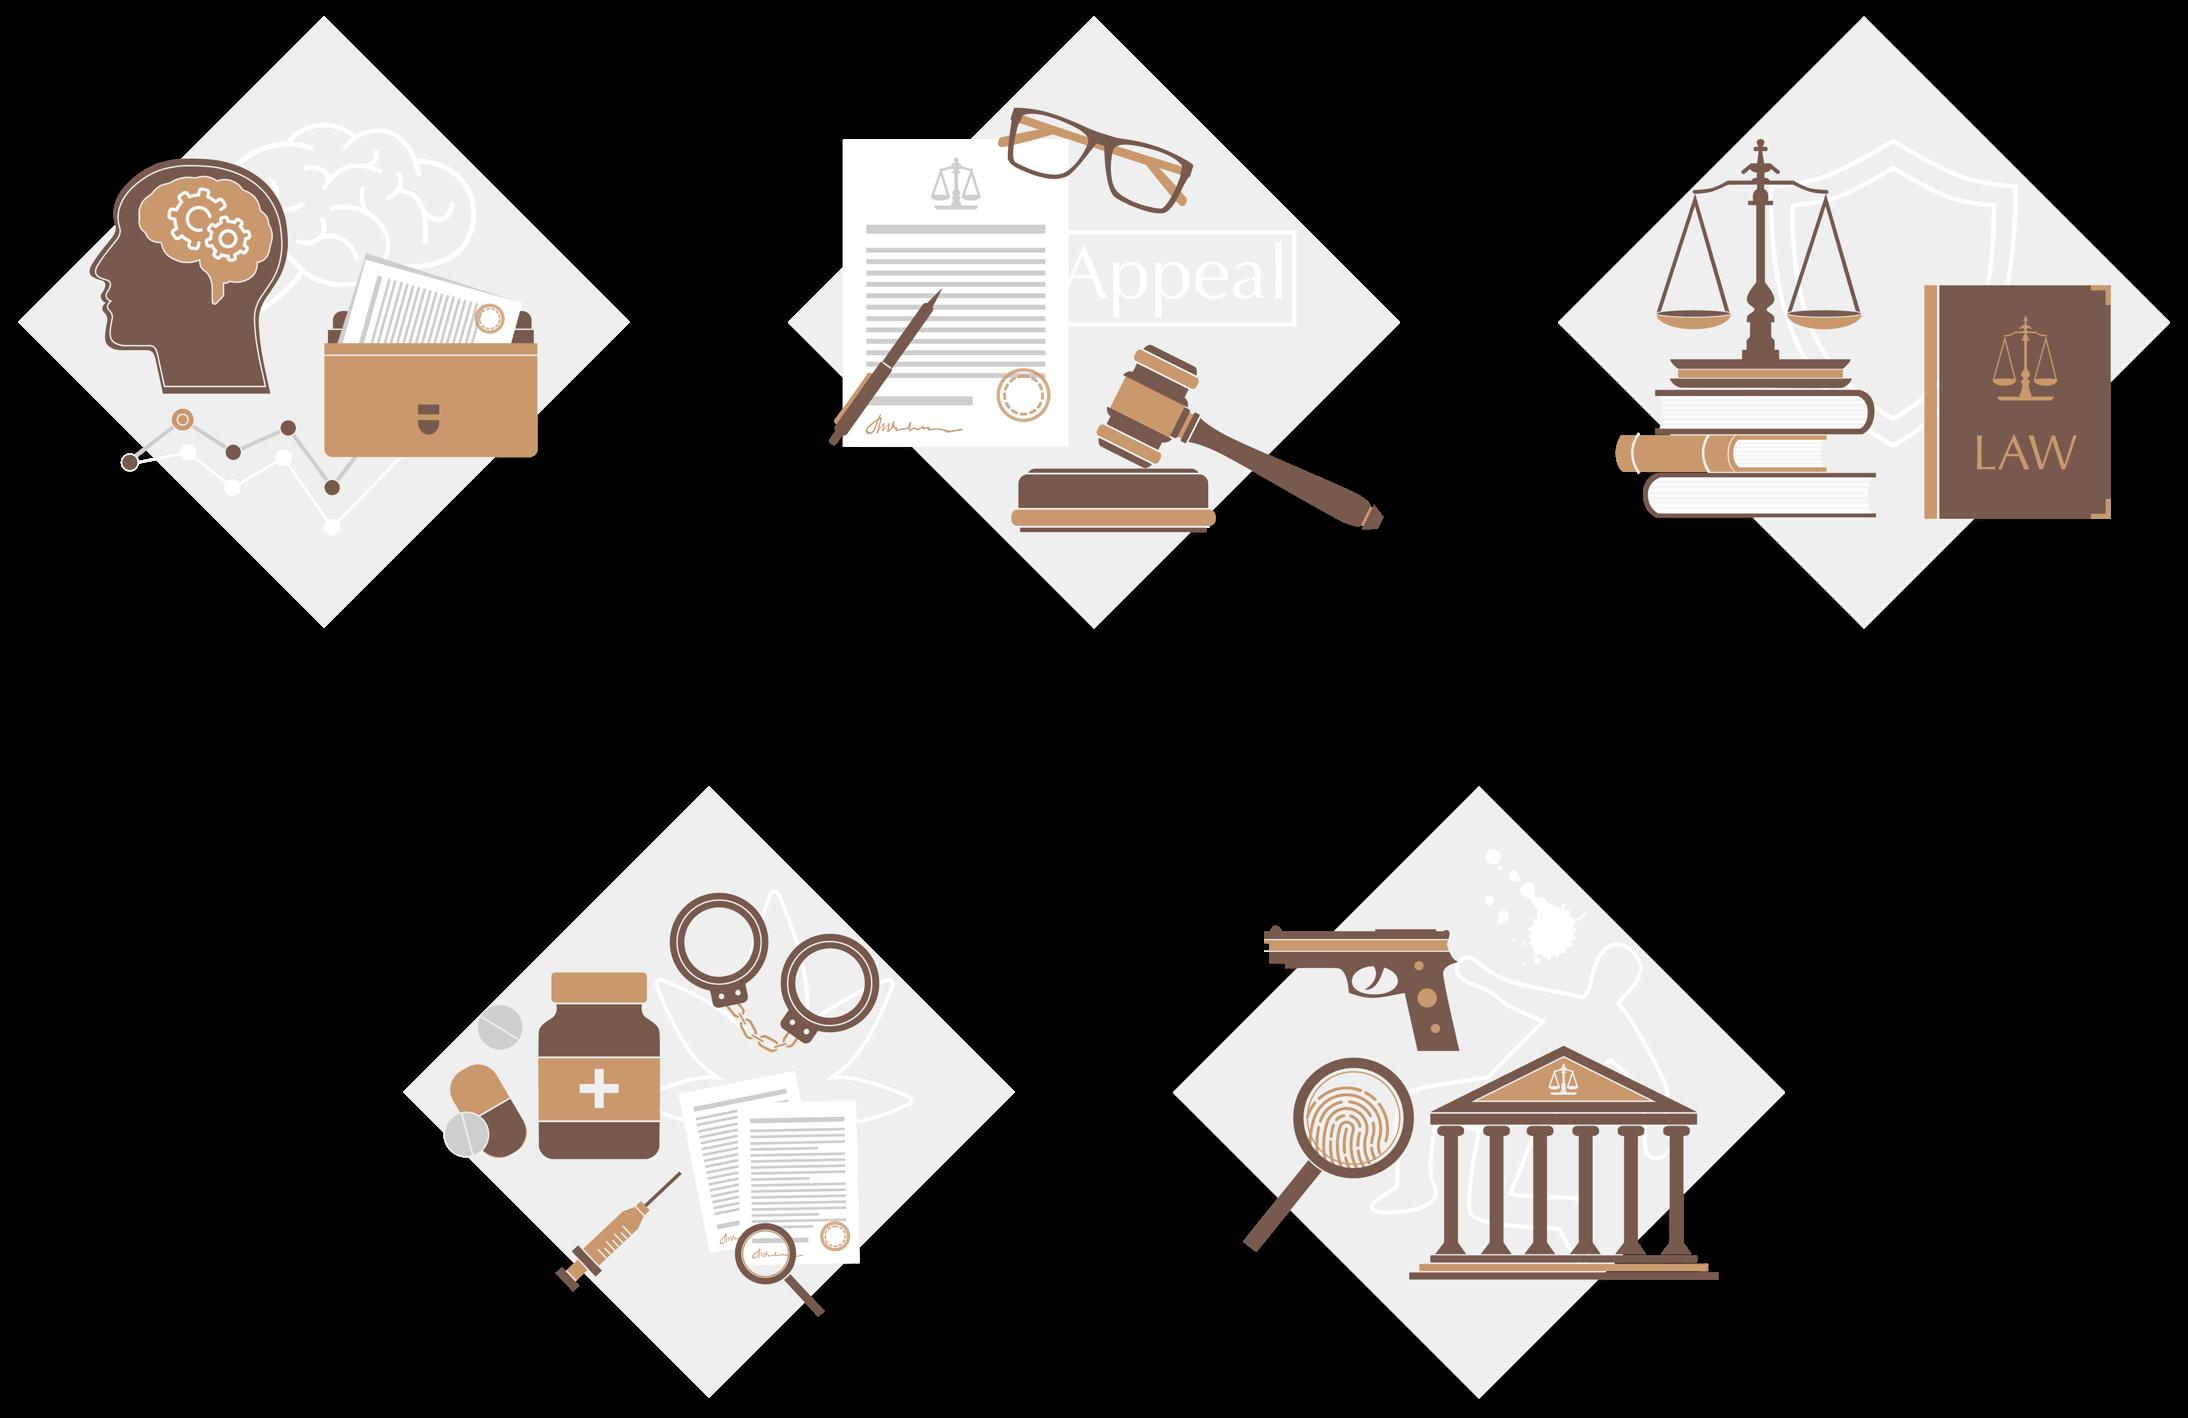 Crime illustrations